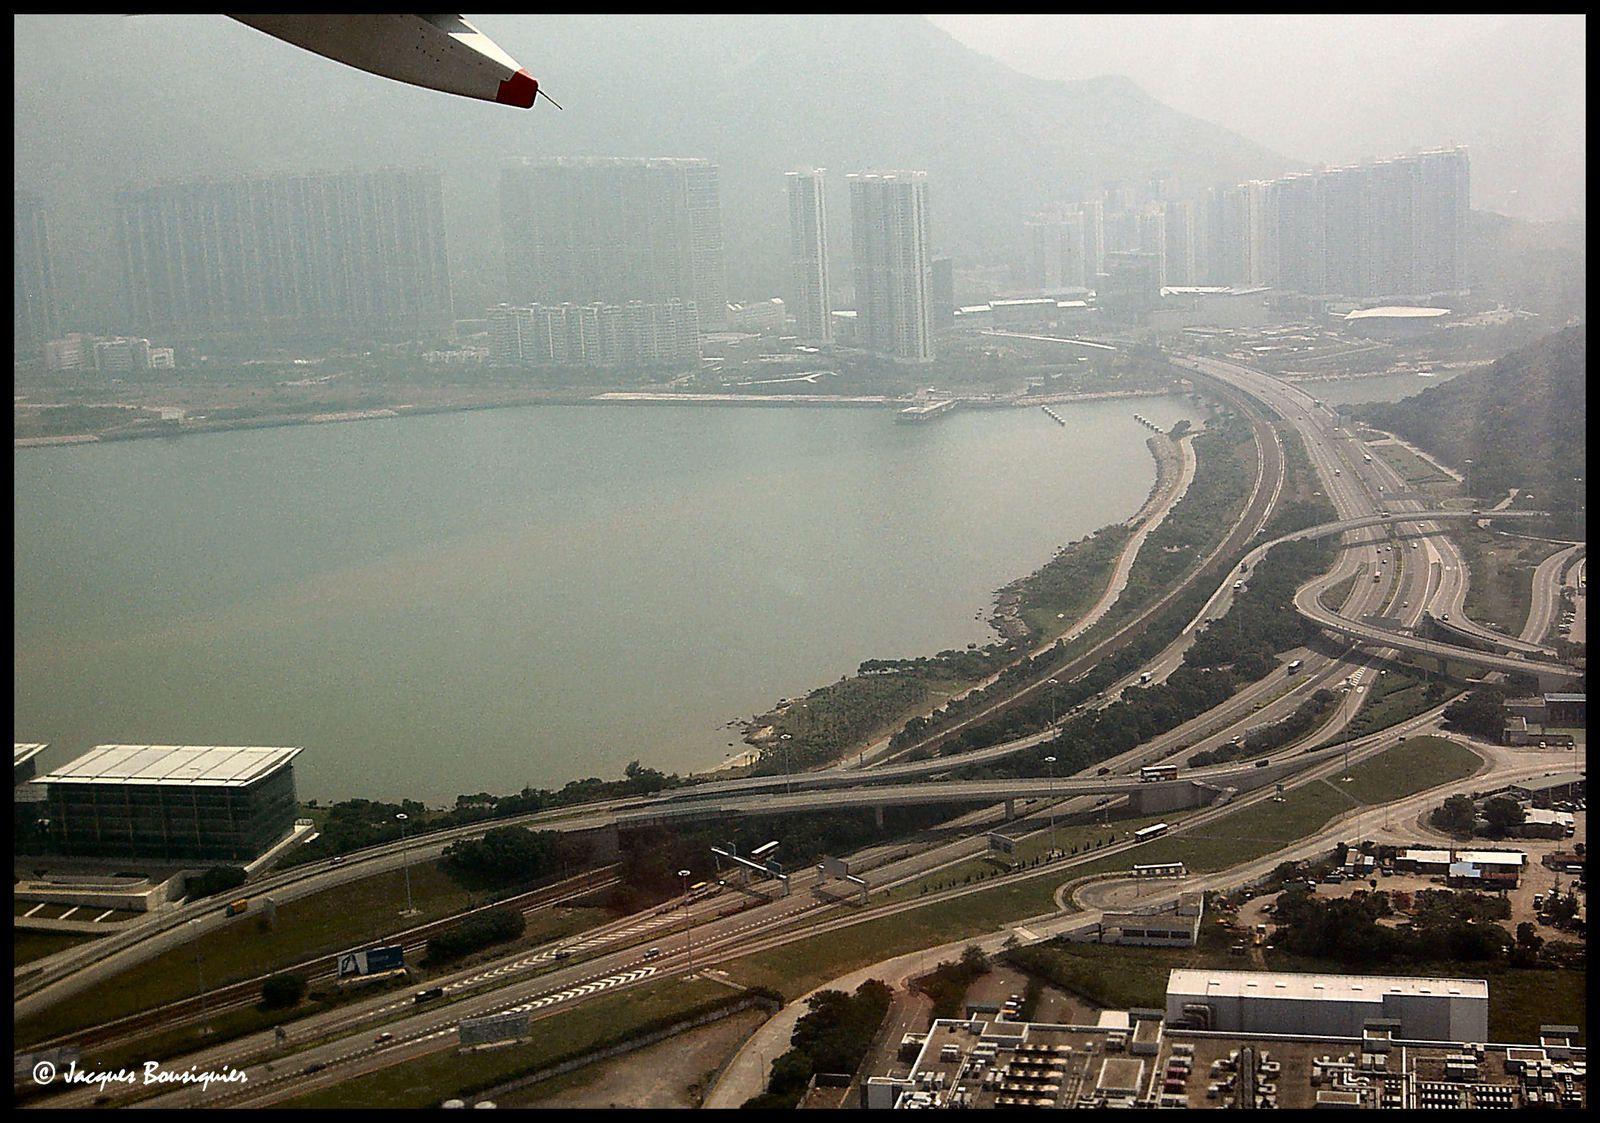 À suivre : Hong Kong by night...